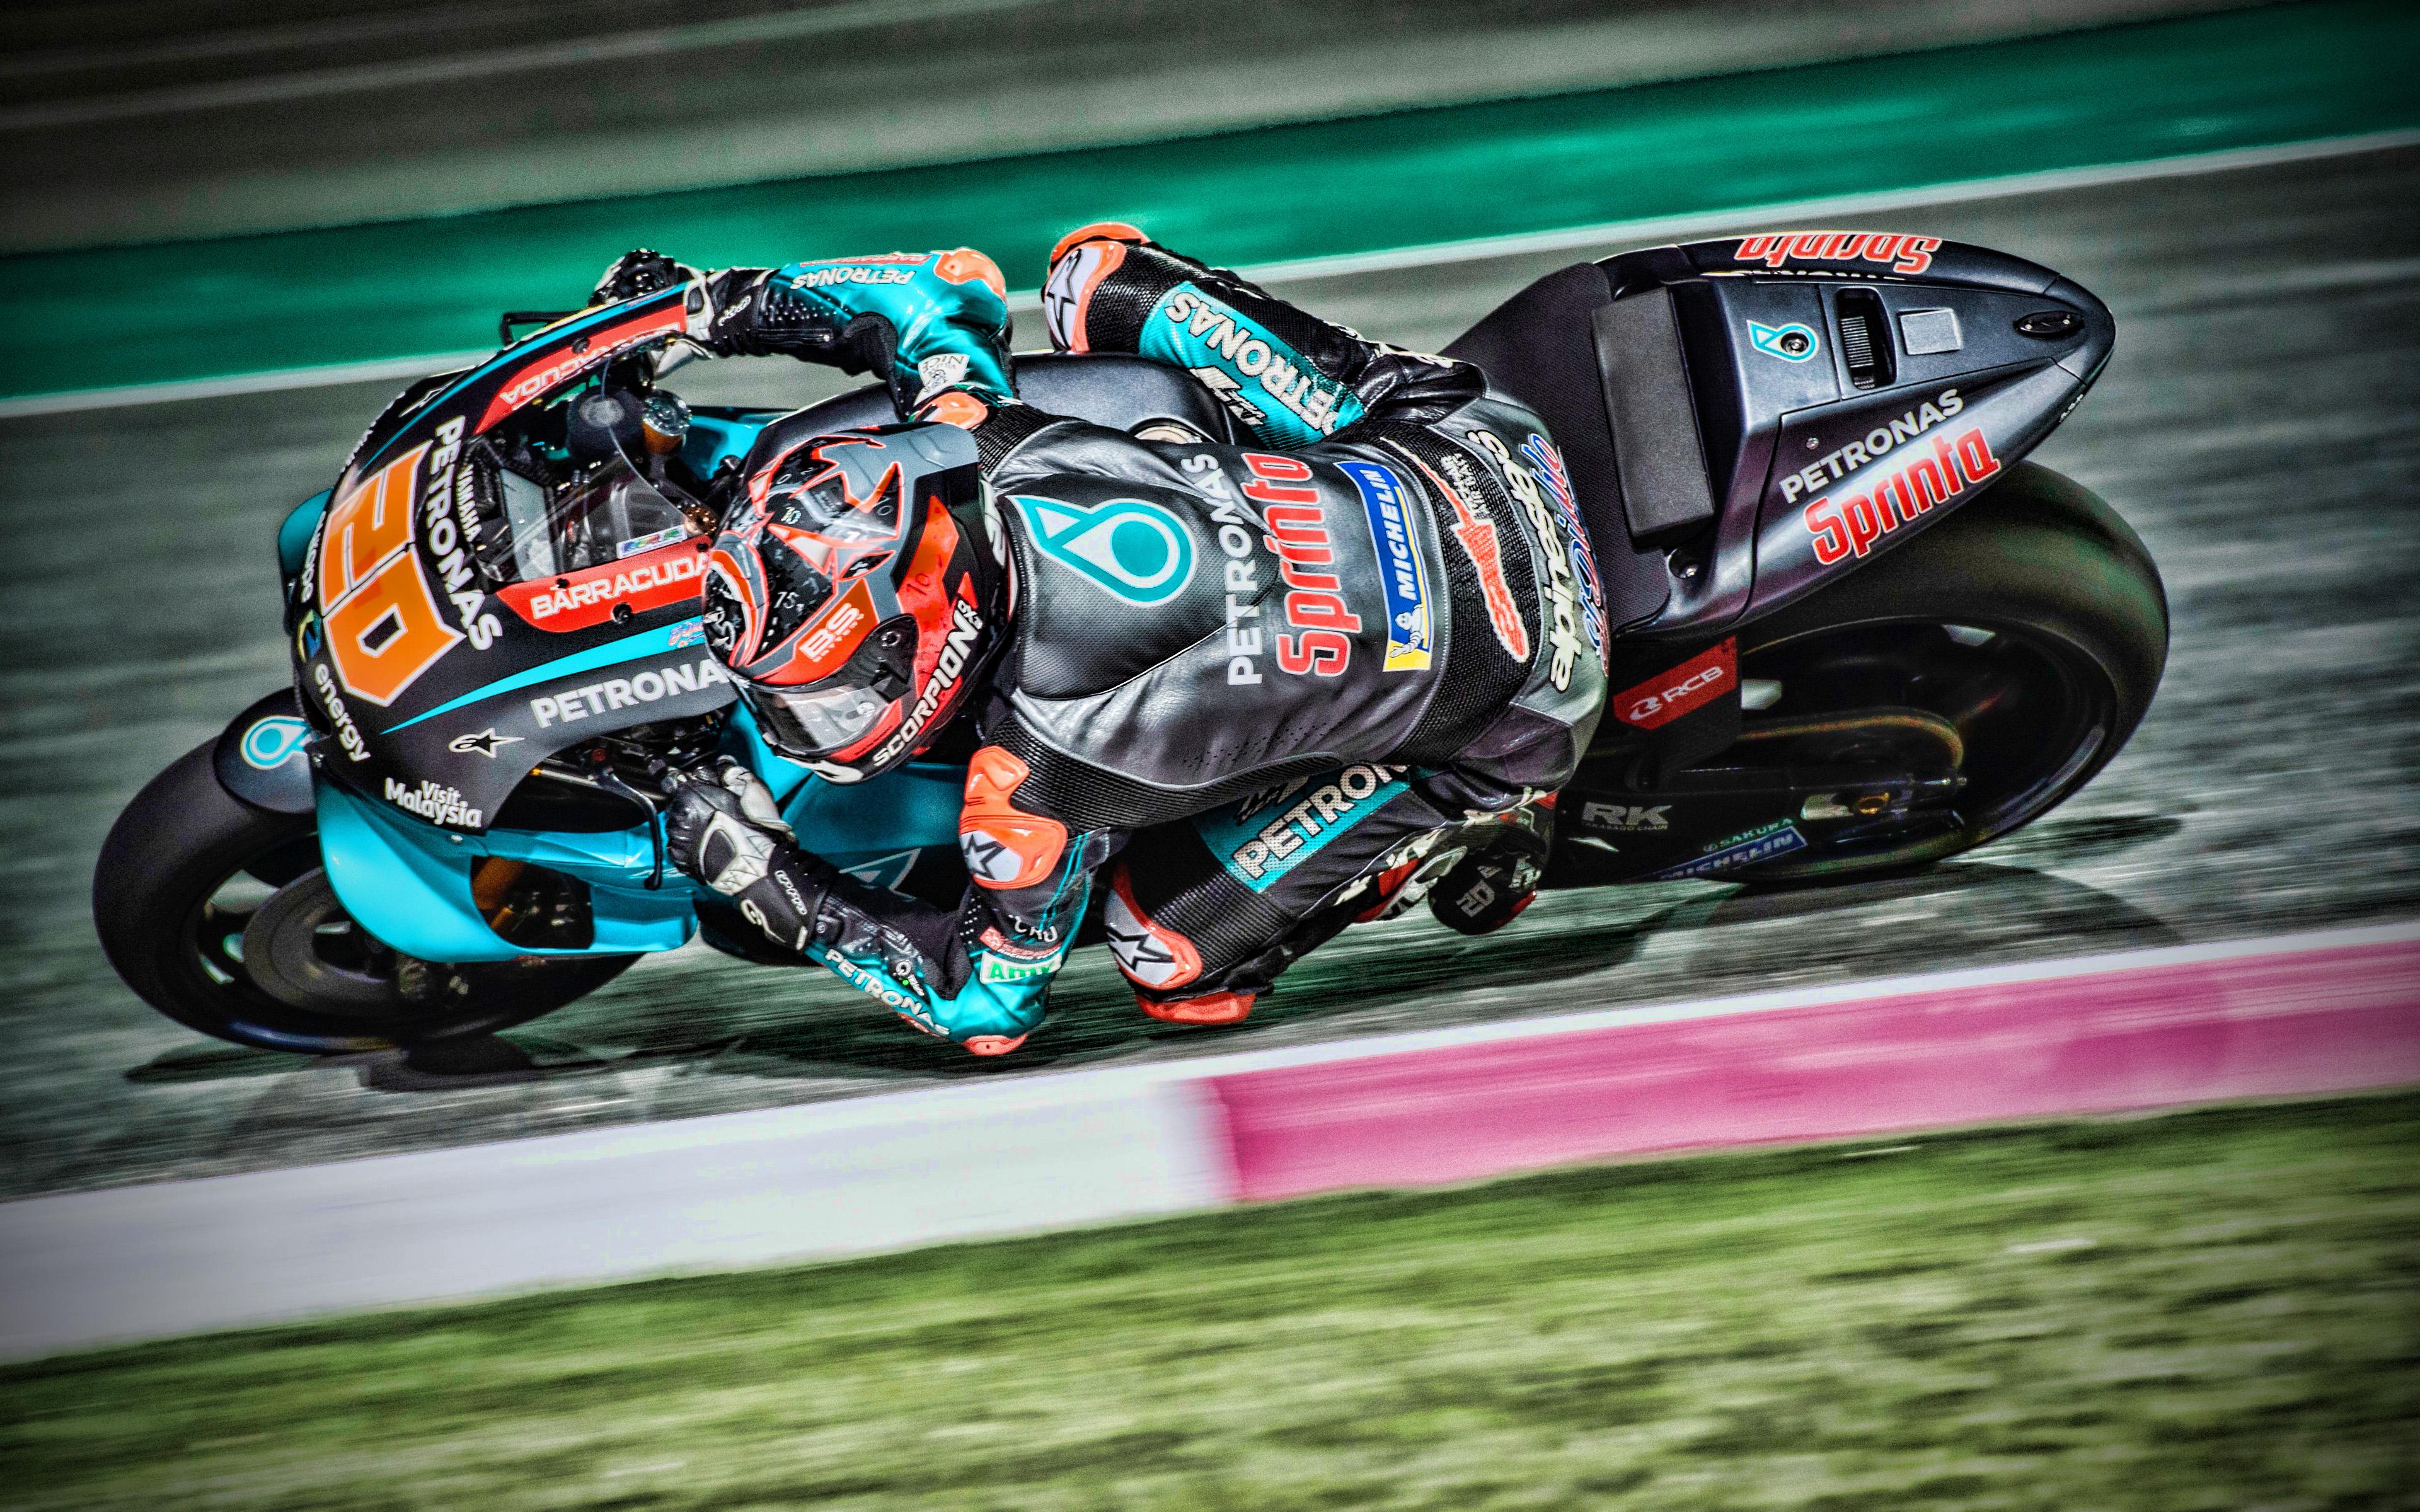 Download wallpapers Fabio Quartararo 4k MotoGP 2019 bikes 3840x2400